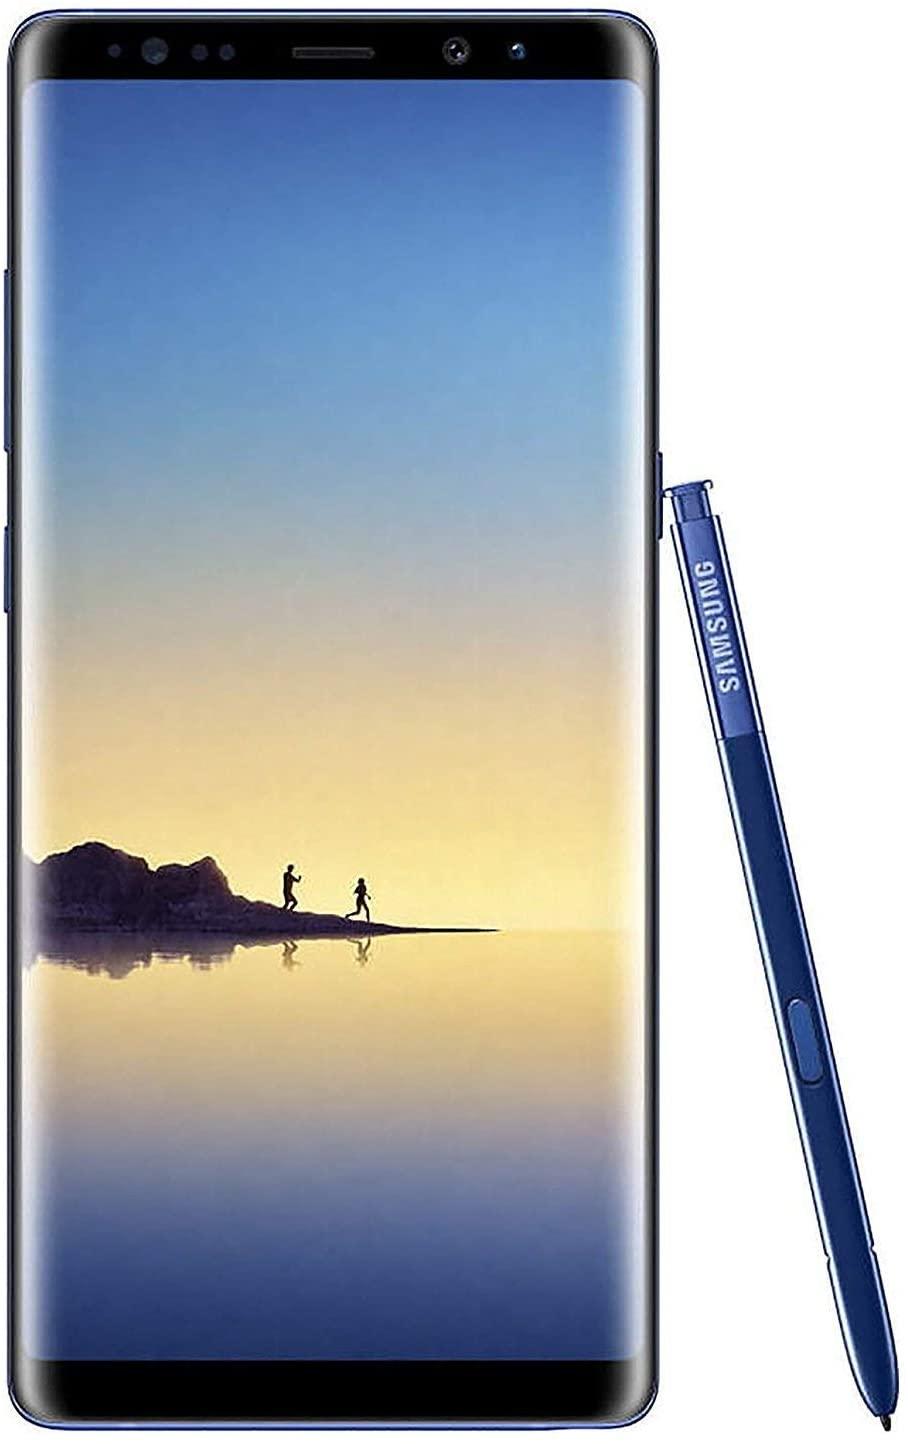 Samsung Galaxy Note 8 N950U 64GB AT&T GSM Unlocked - Deep Sea Blue (Renewed)